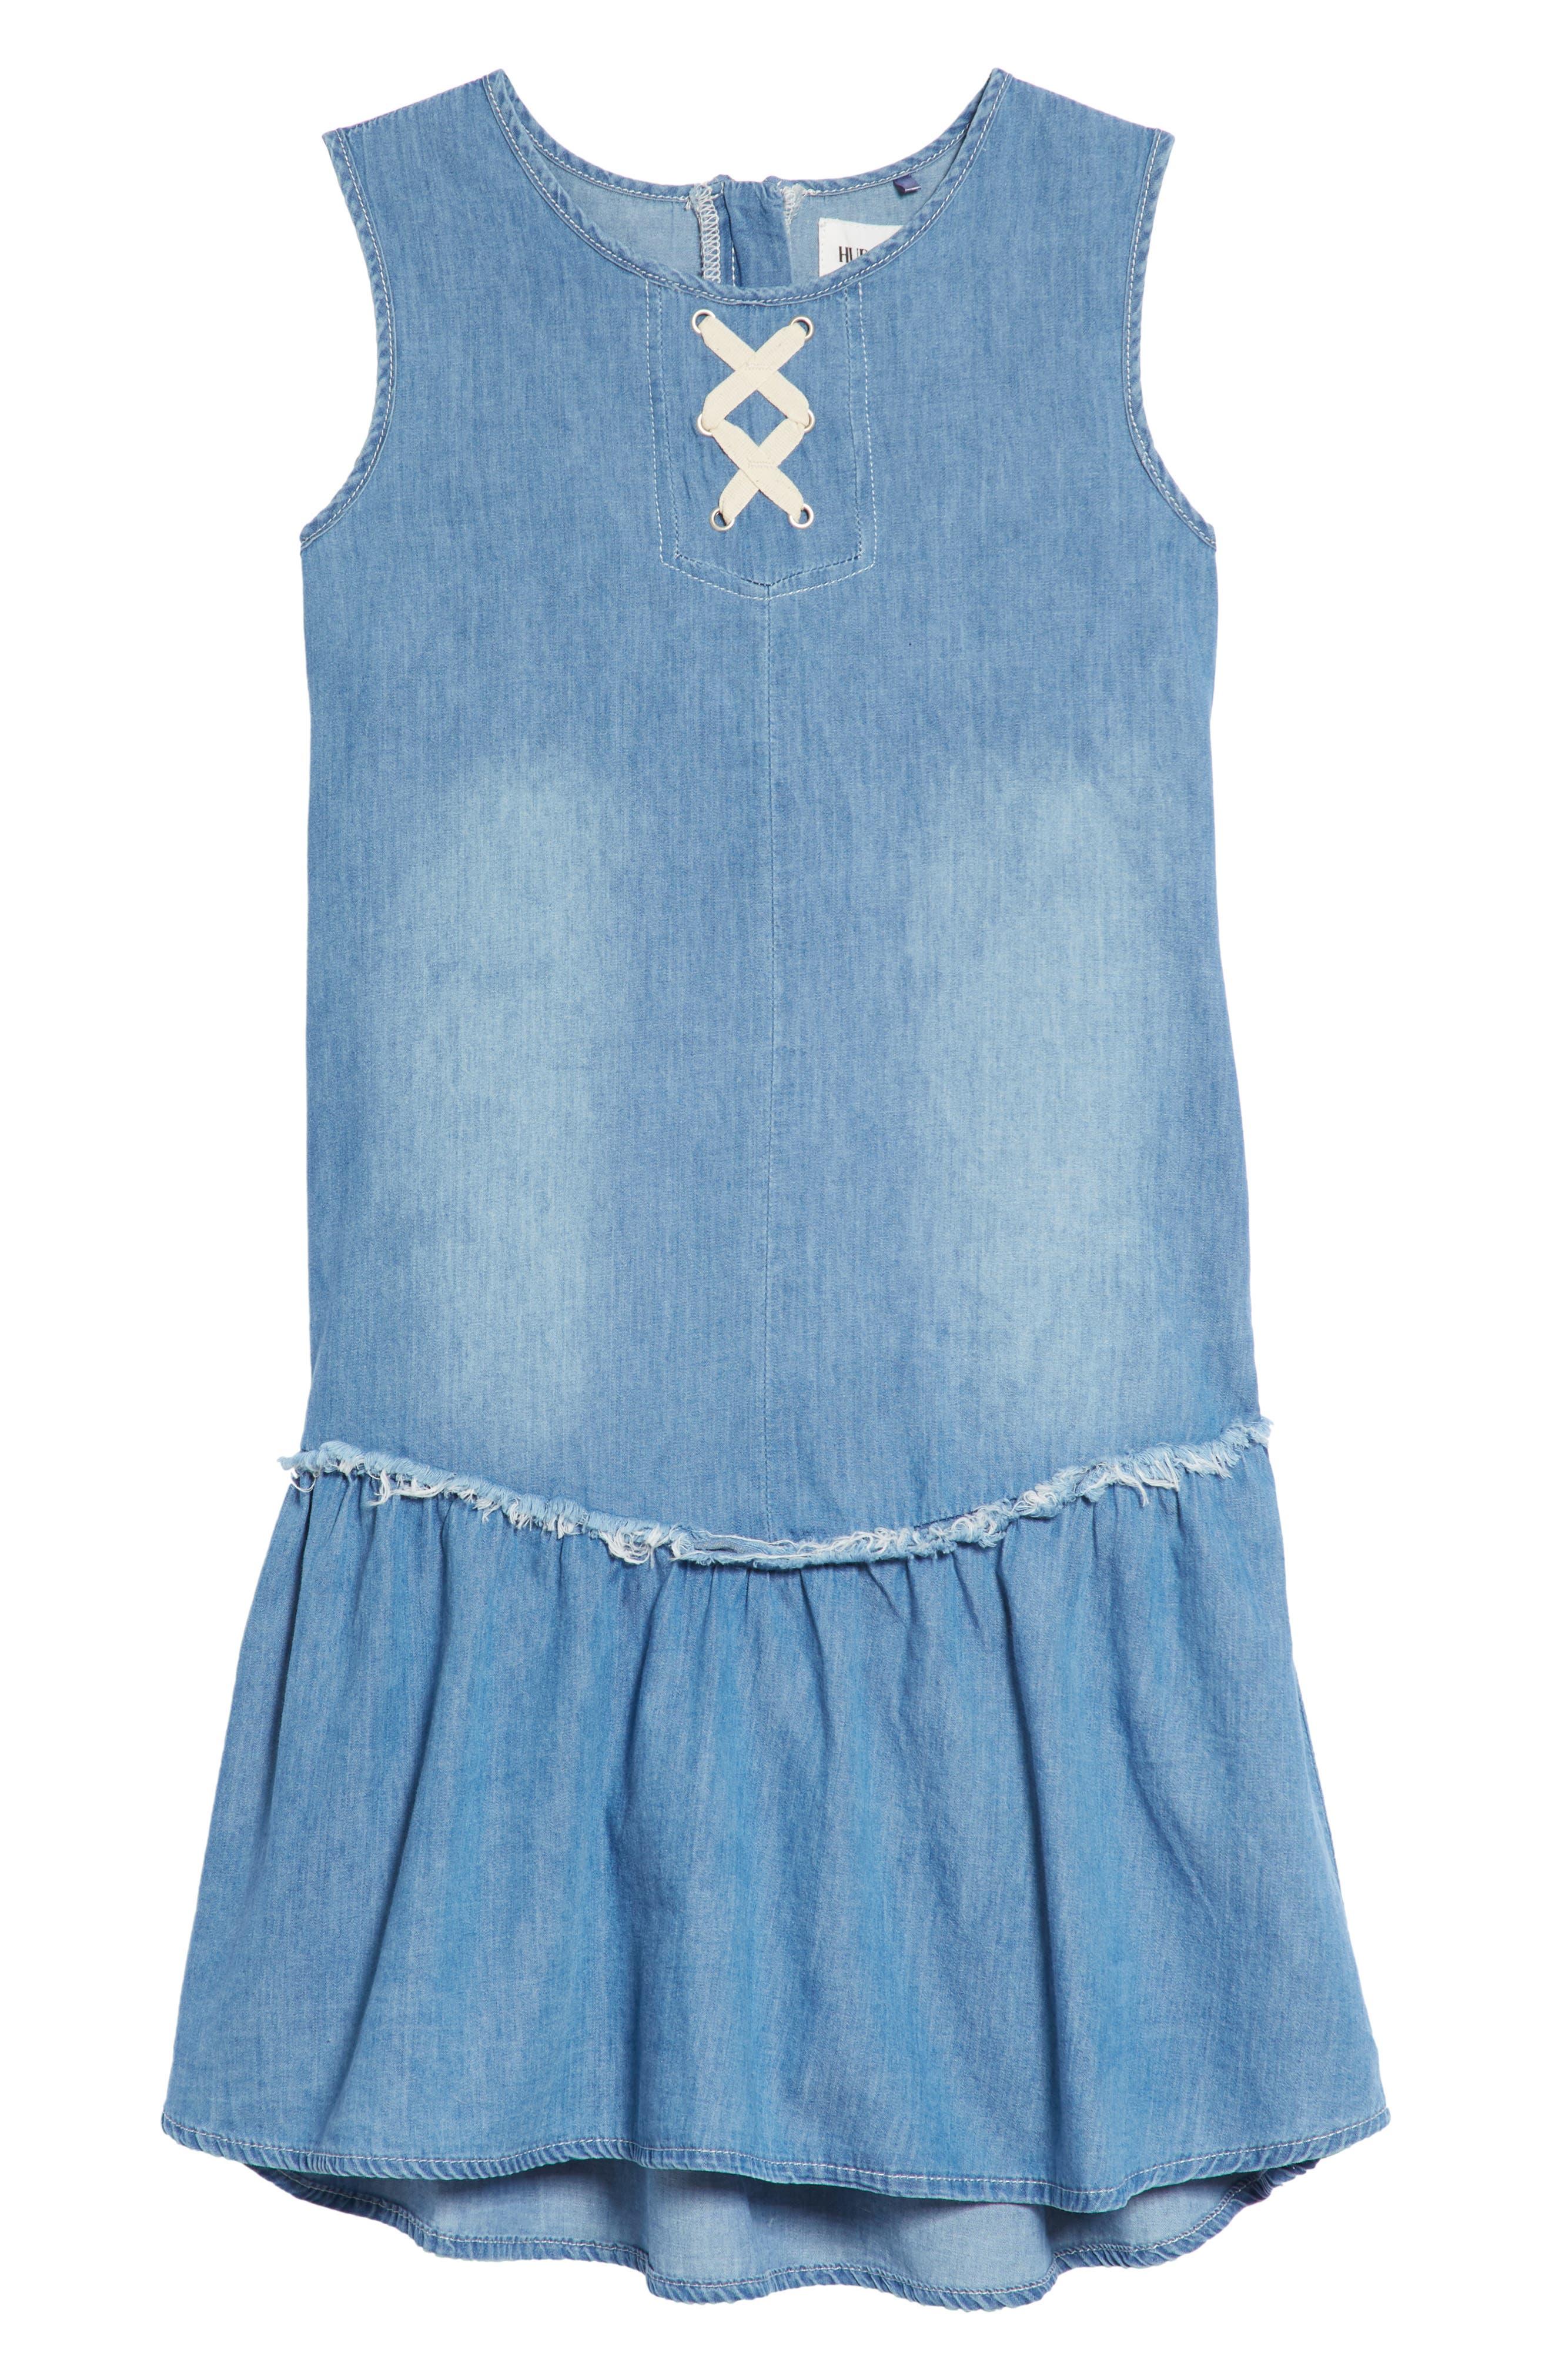 Lulu Lace-Up Chambray Dress,                             Main thumbnail 1, color,                             Light Blue